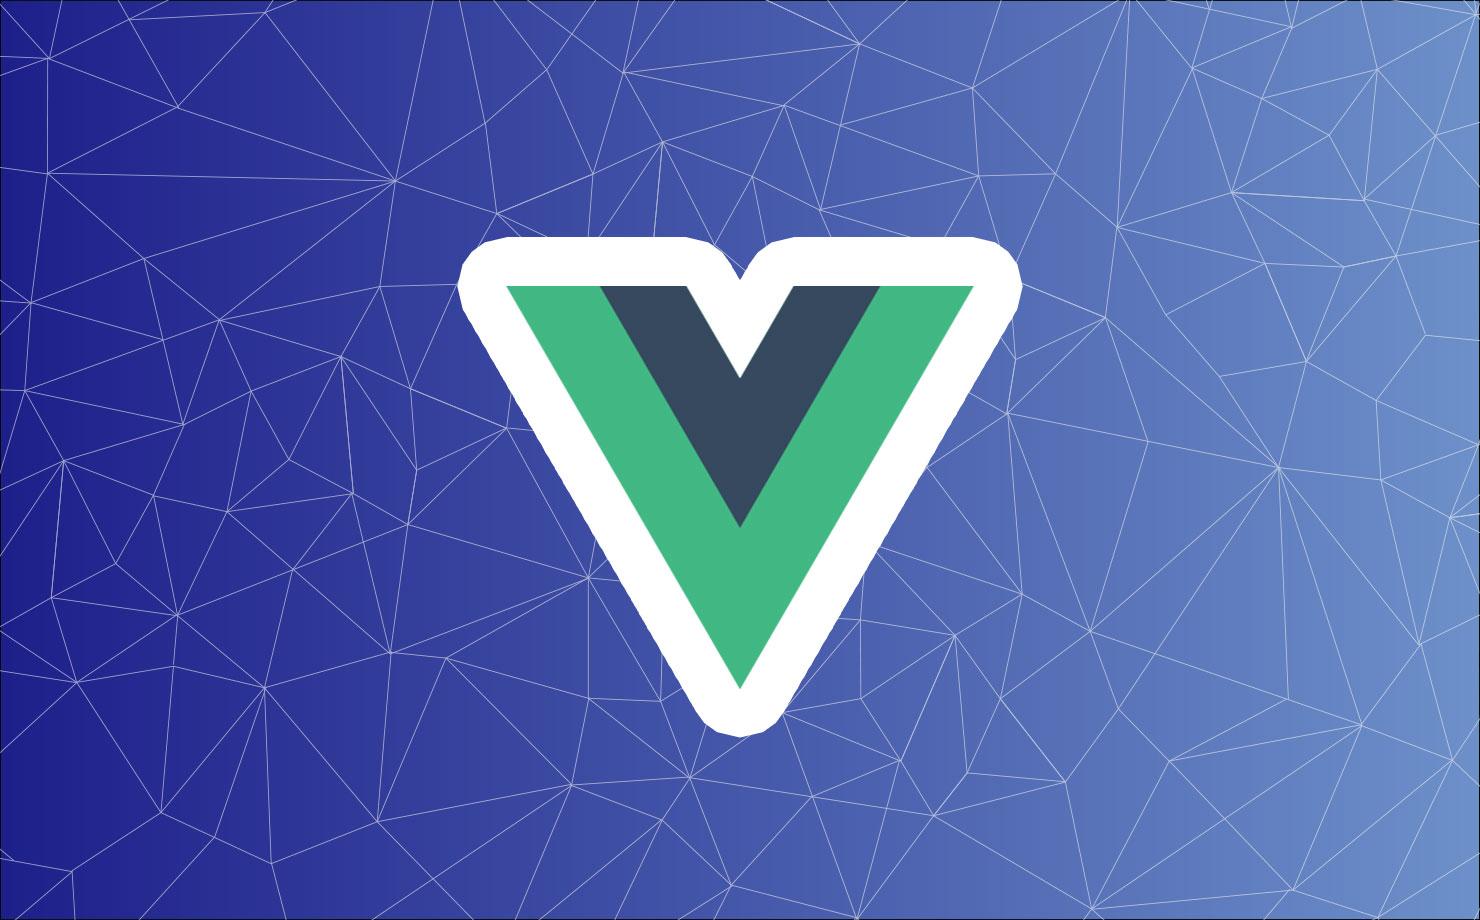 Vue framework